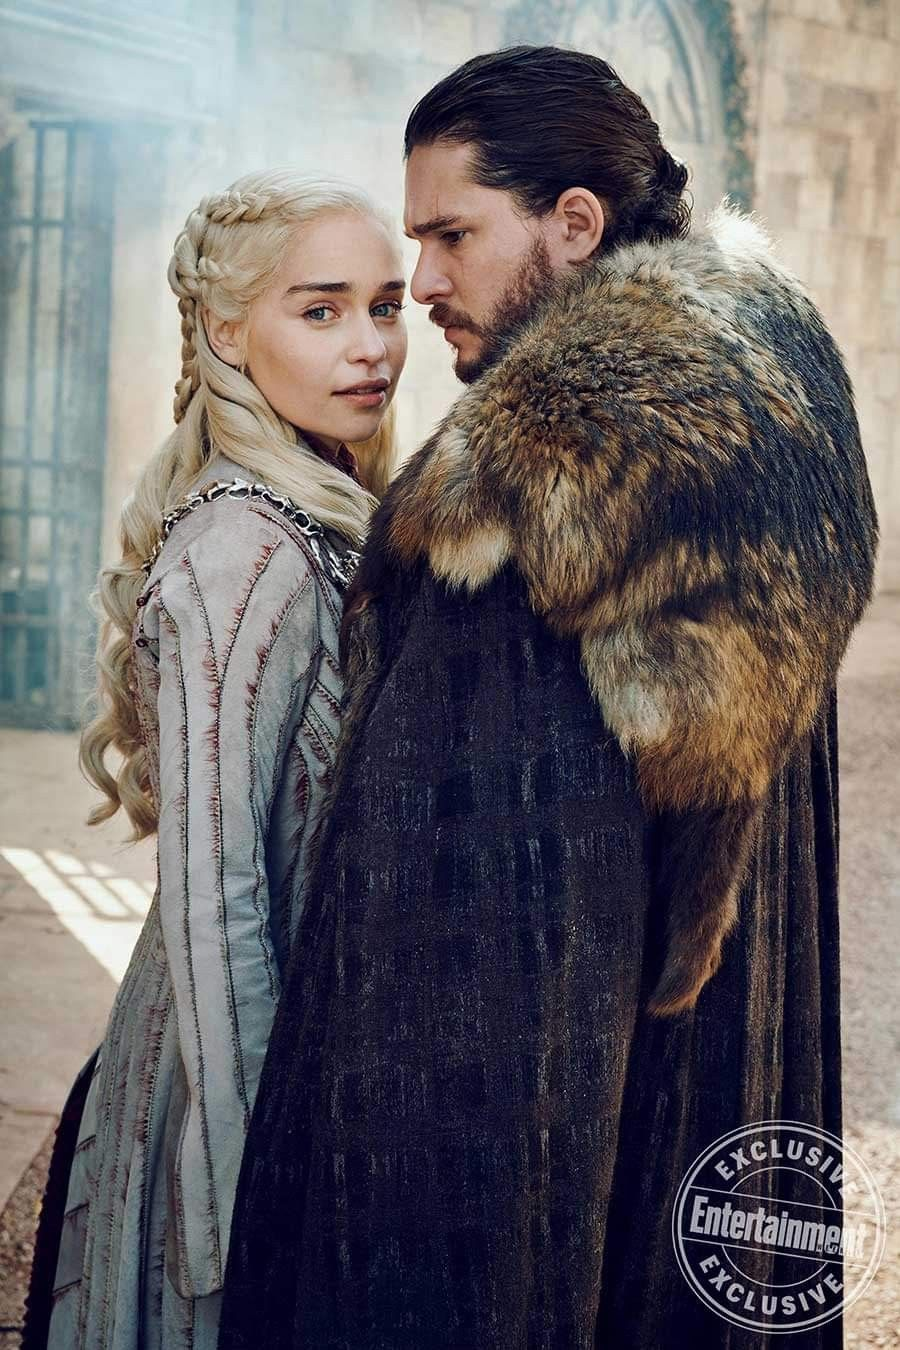 Emilia Clarke With Kit Harington Game Of Thrones Cast Daenerys And Jon Jon Snow And Daenerys